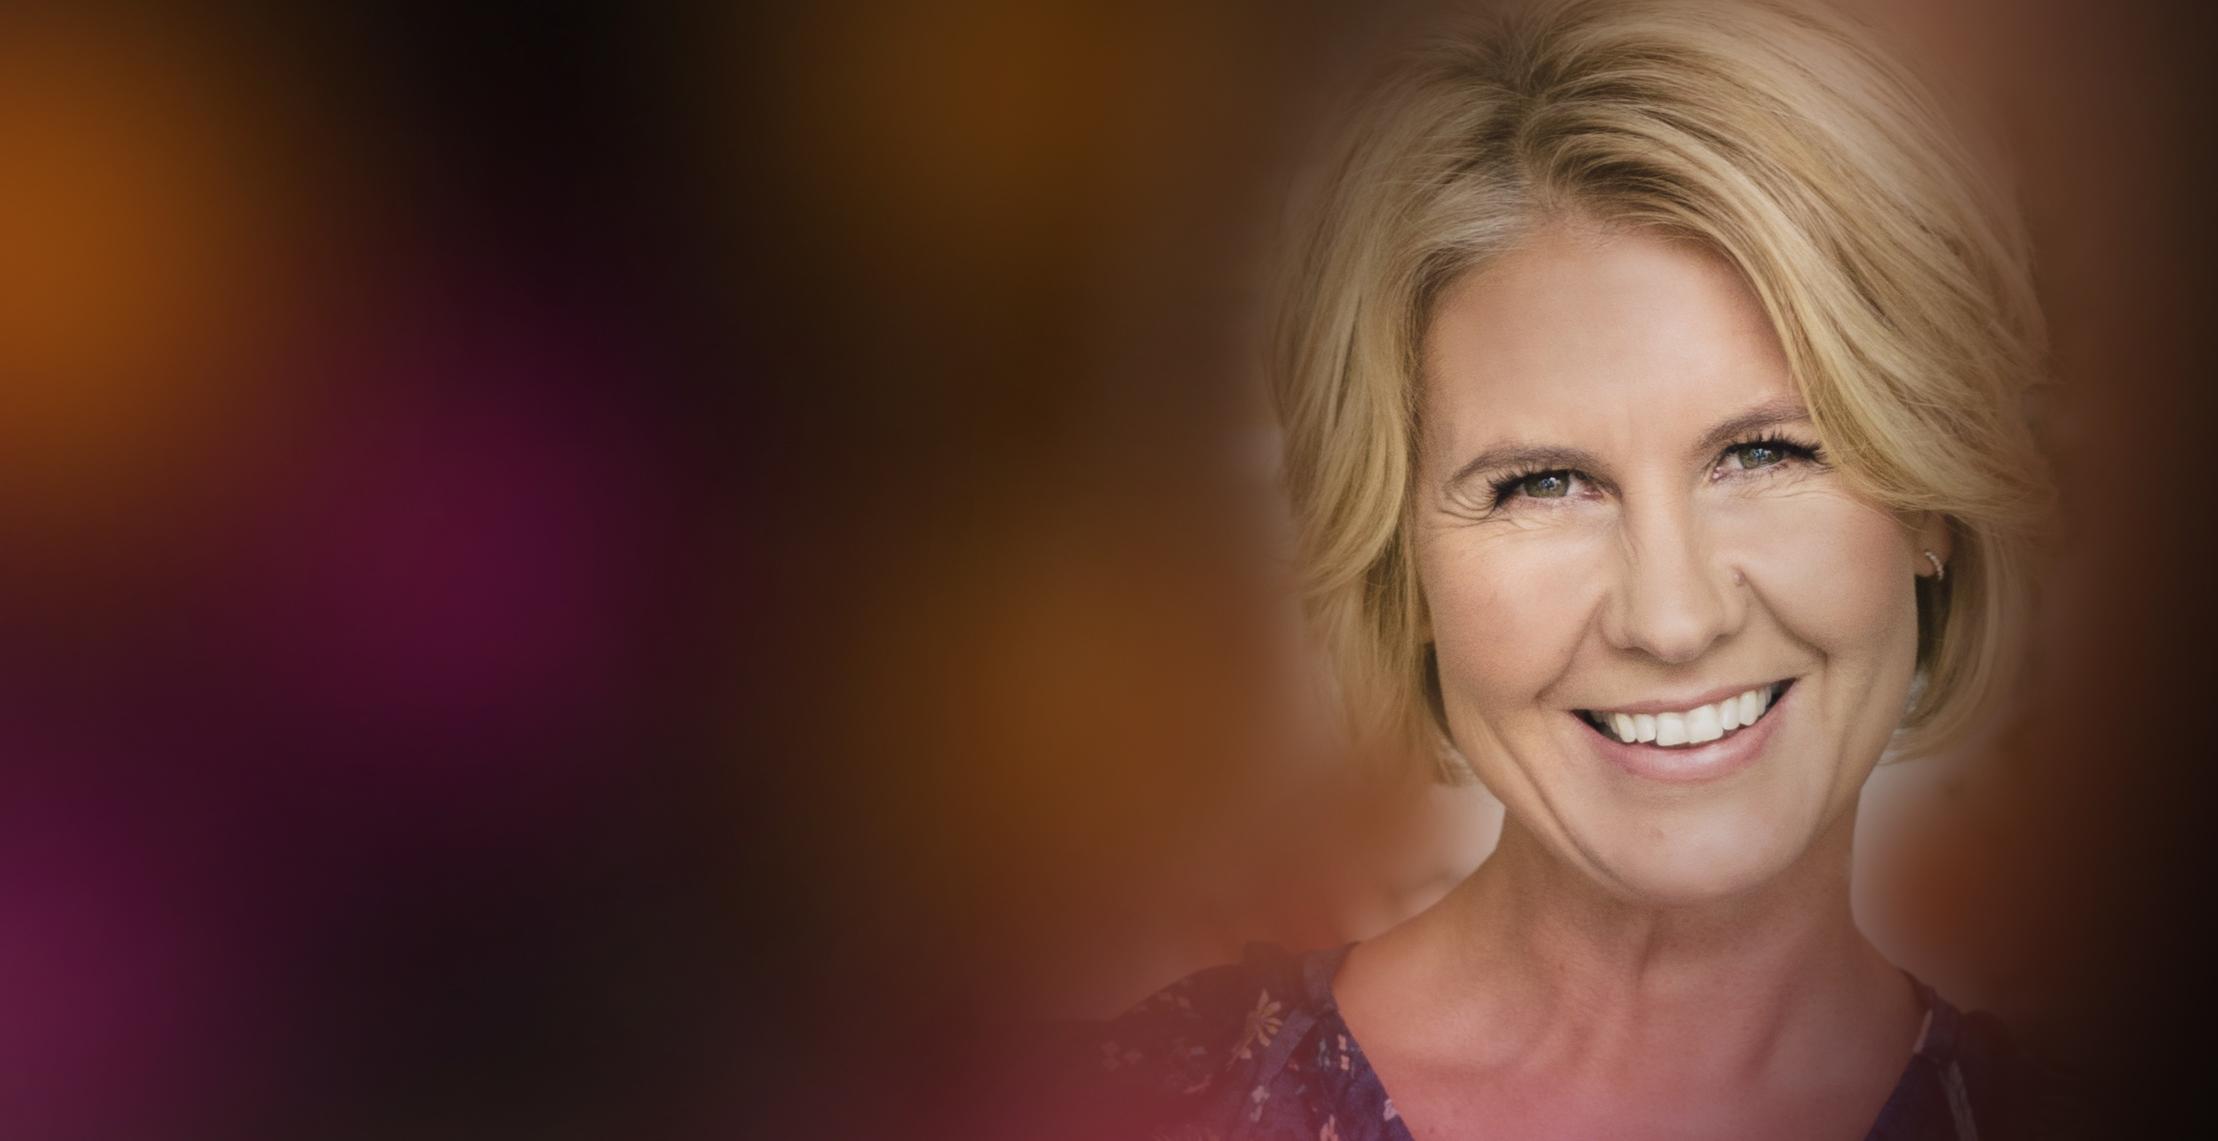 Marie Thorslund 4good och Sunshinepodden i Sälen